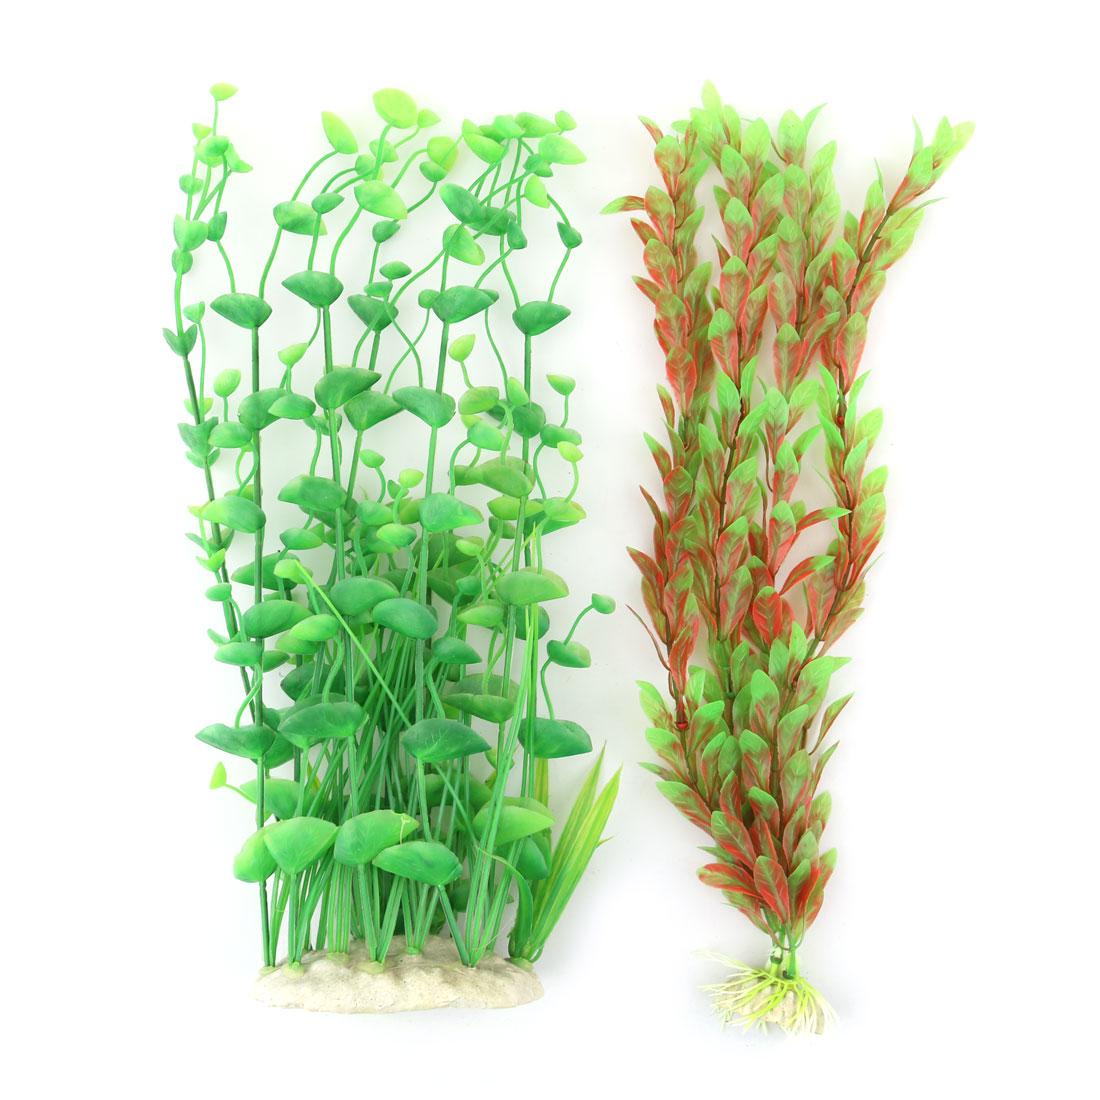 Aquarium Fish Tank Plastic Artificial Landscape Underwater Water Grass Plant Decor Green 2 in 1